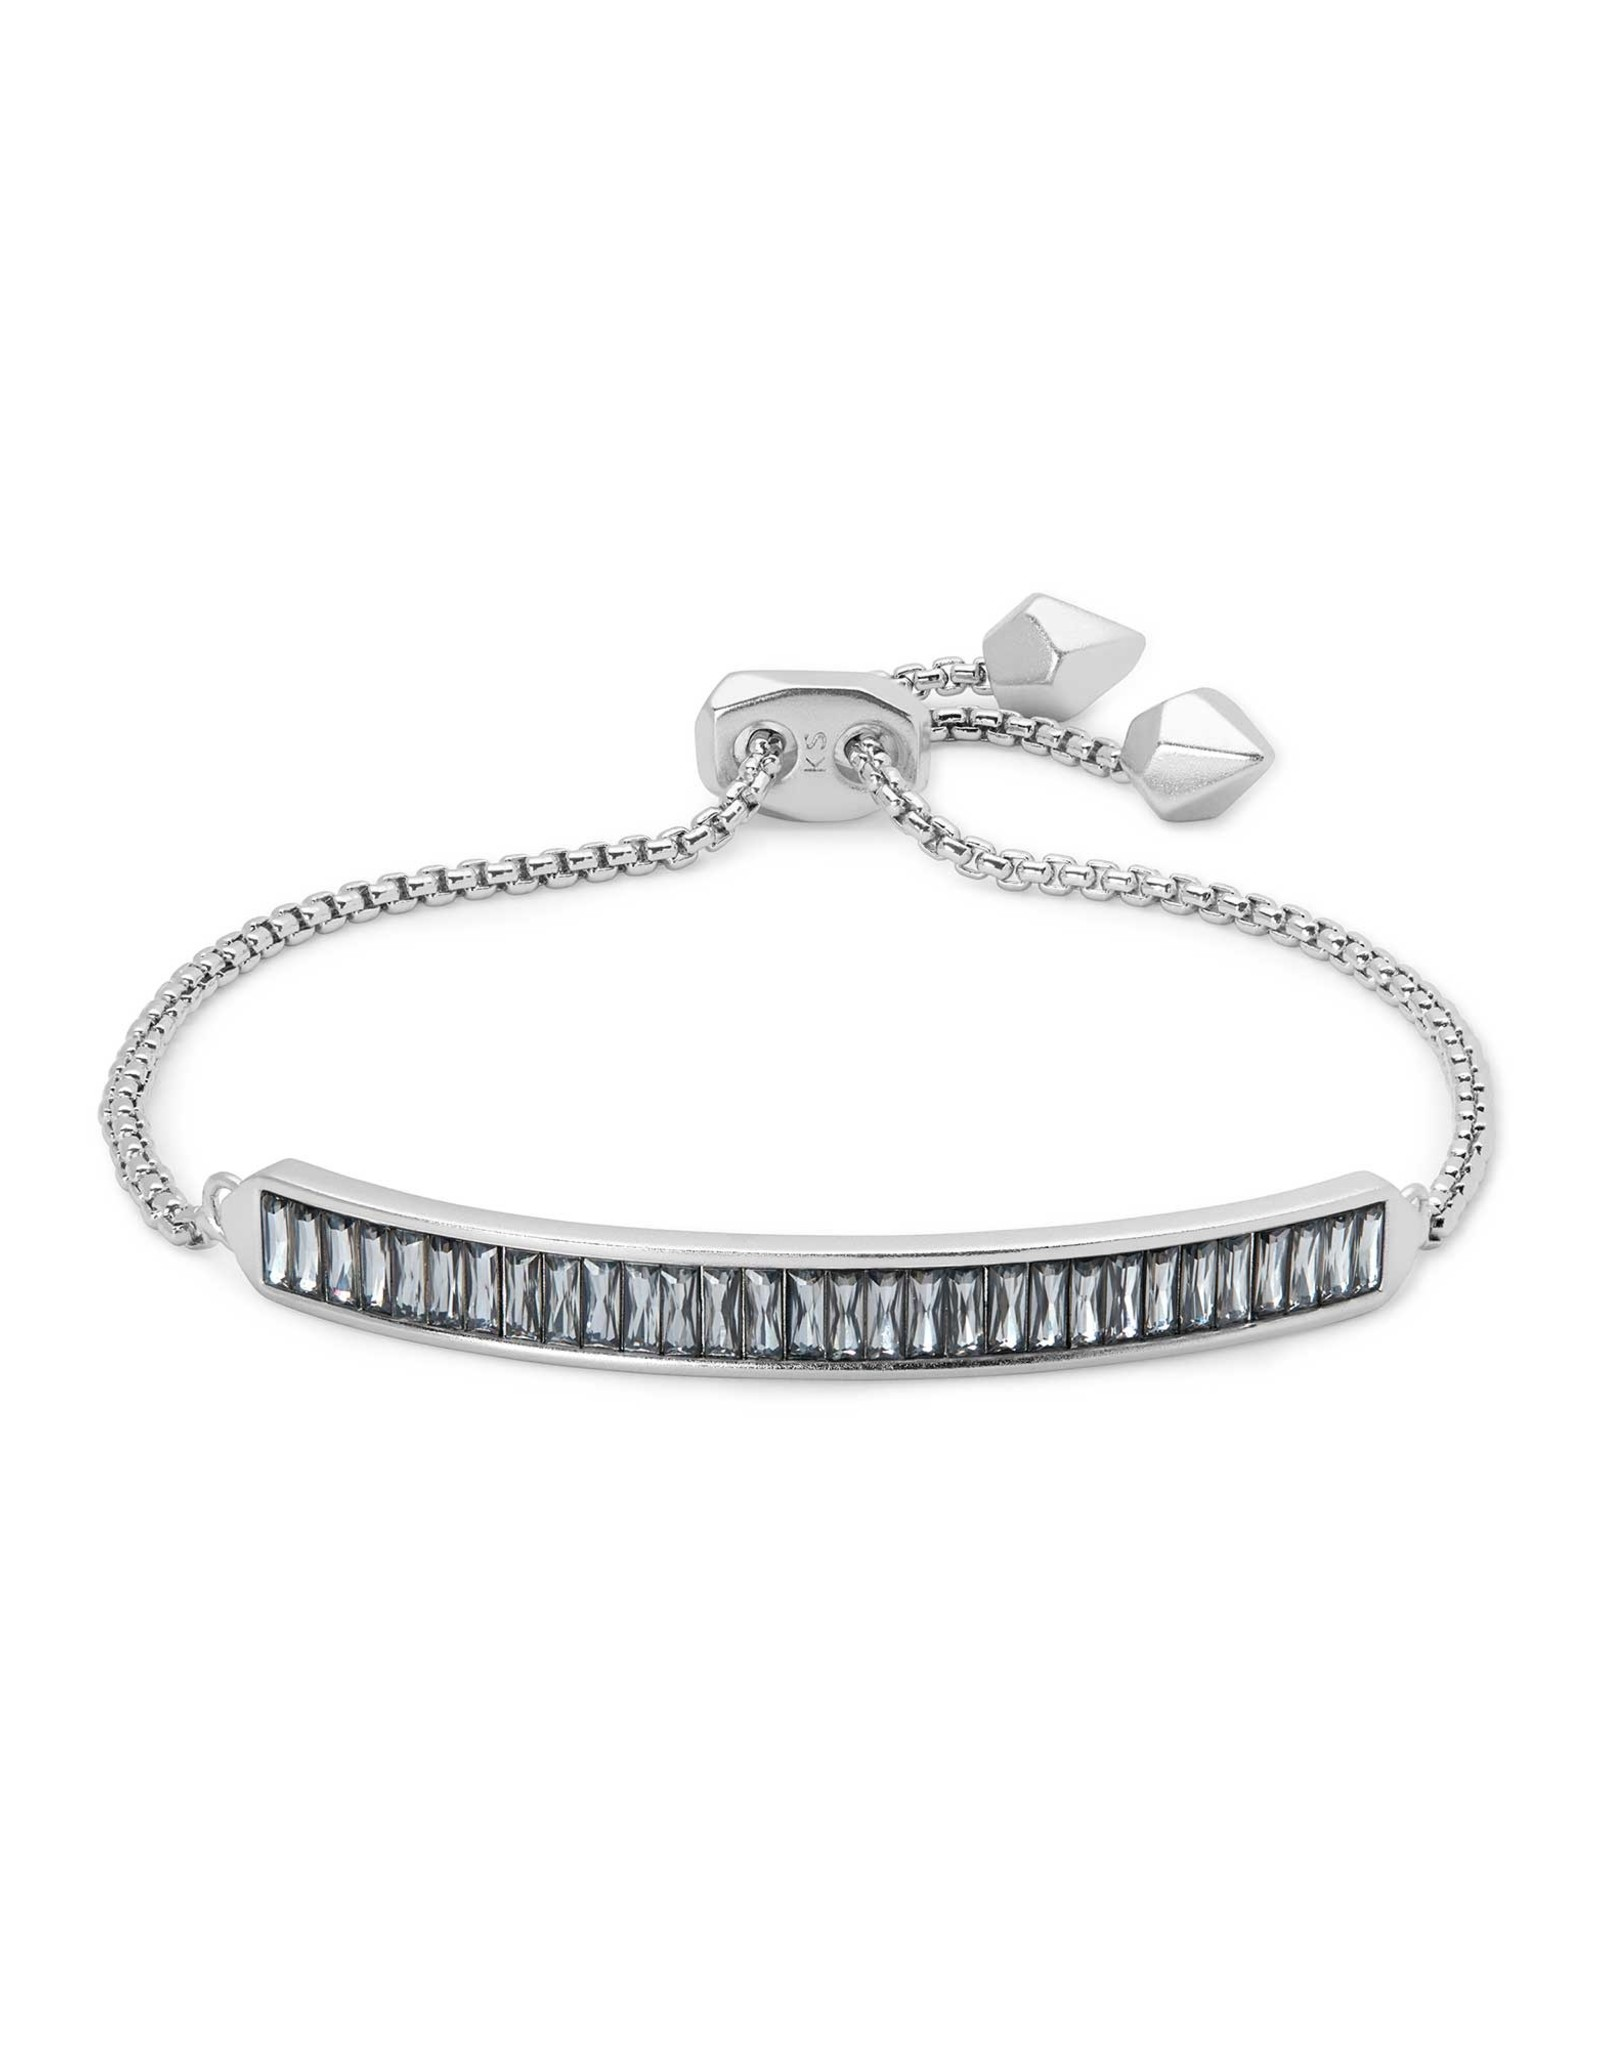 Kendra Scott Jack Delicate Chain Bracelet - Gray Crystal/Rhodium